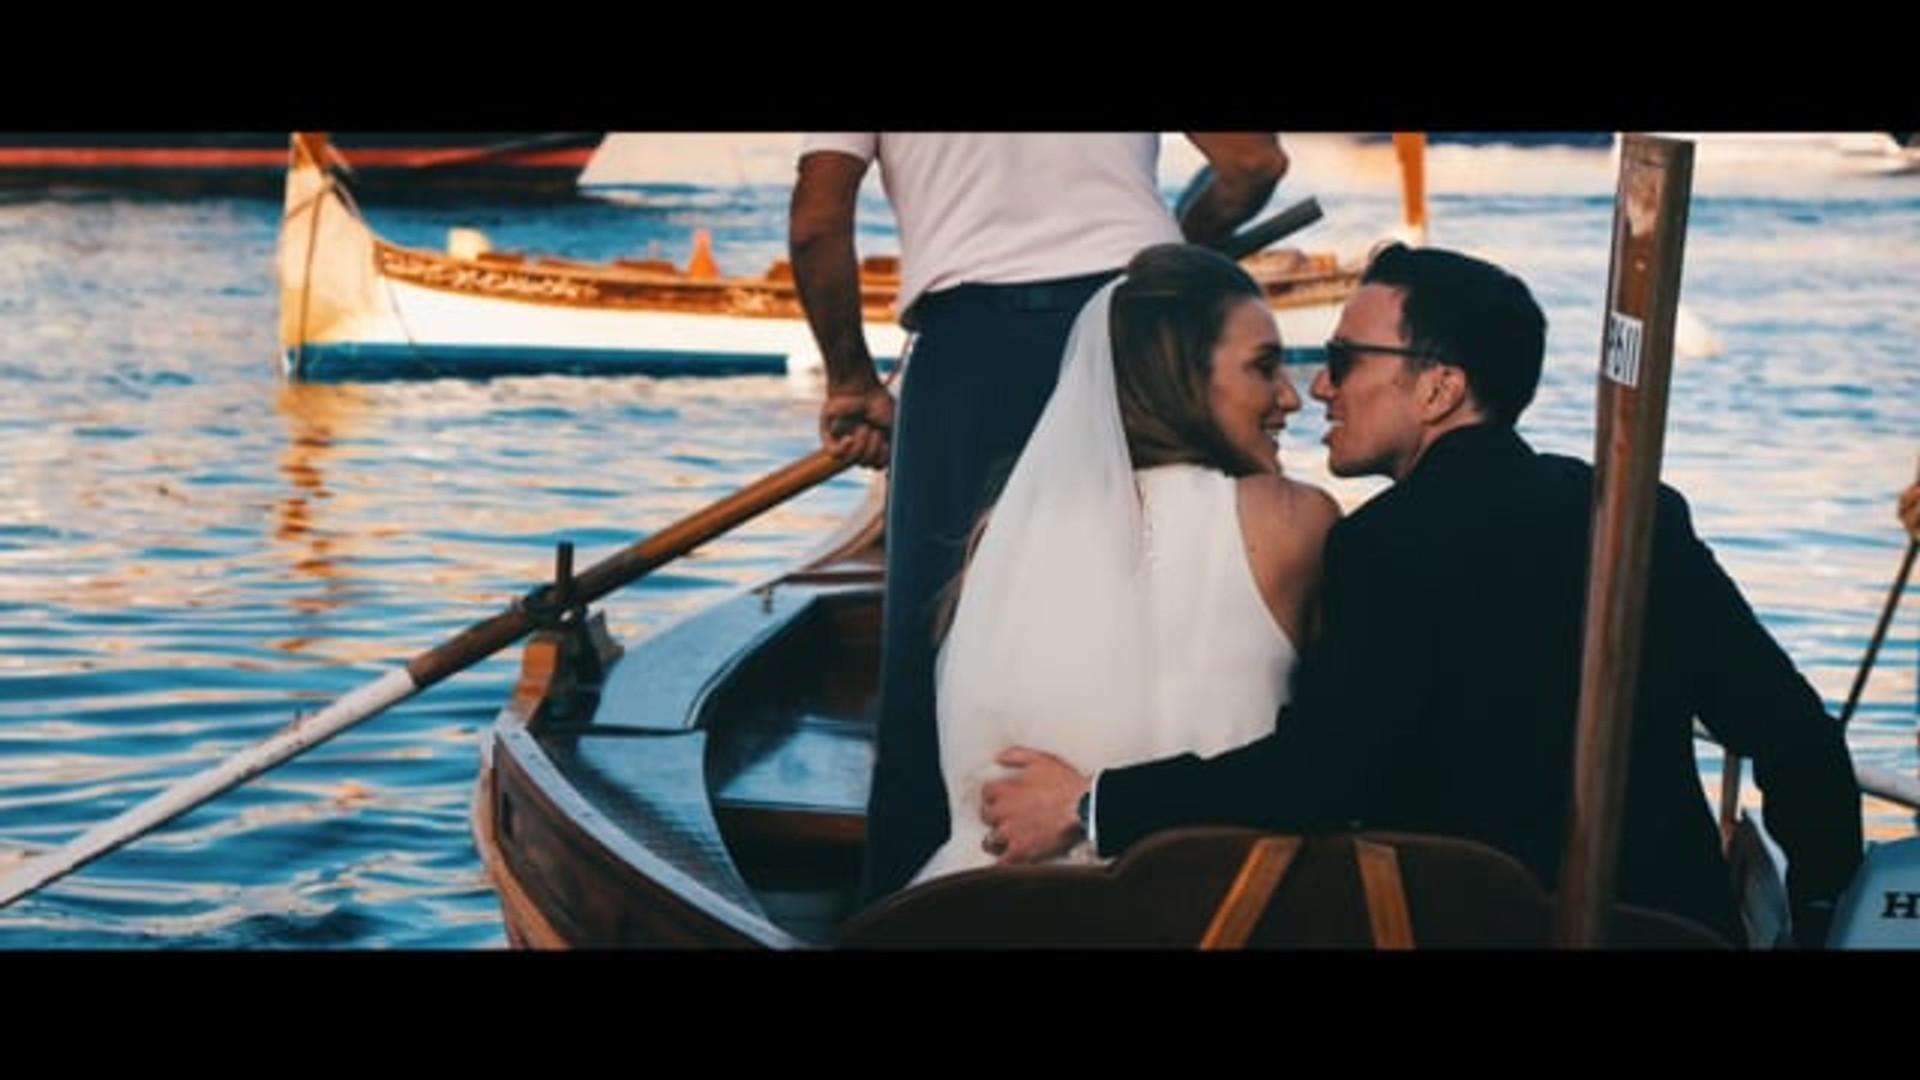 Kati + Aaron - The Wedding Trailer